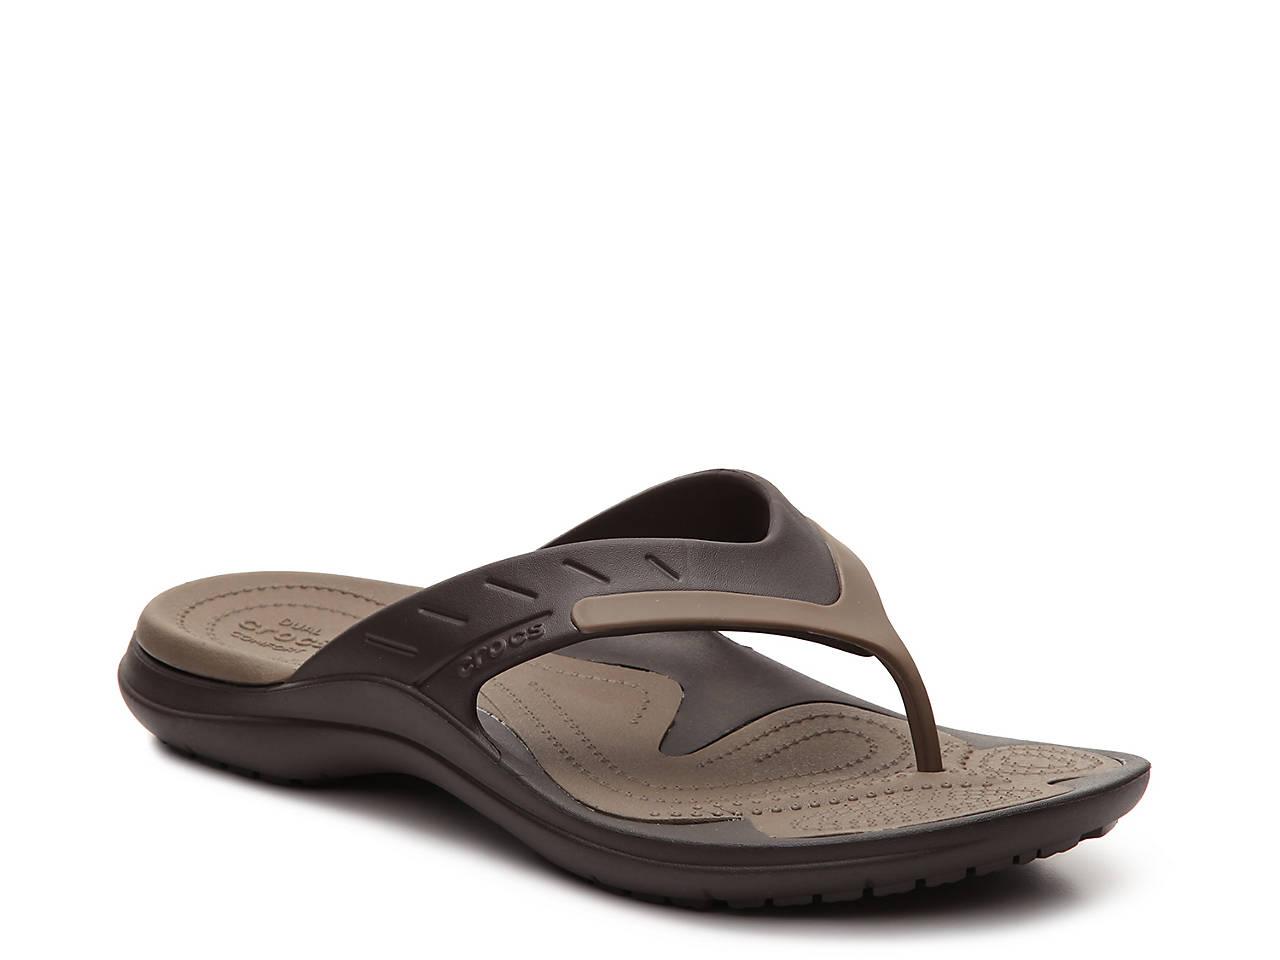 1a46de8f722421 Crocs Modi Sport Flip Flop Men s Shoes